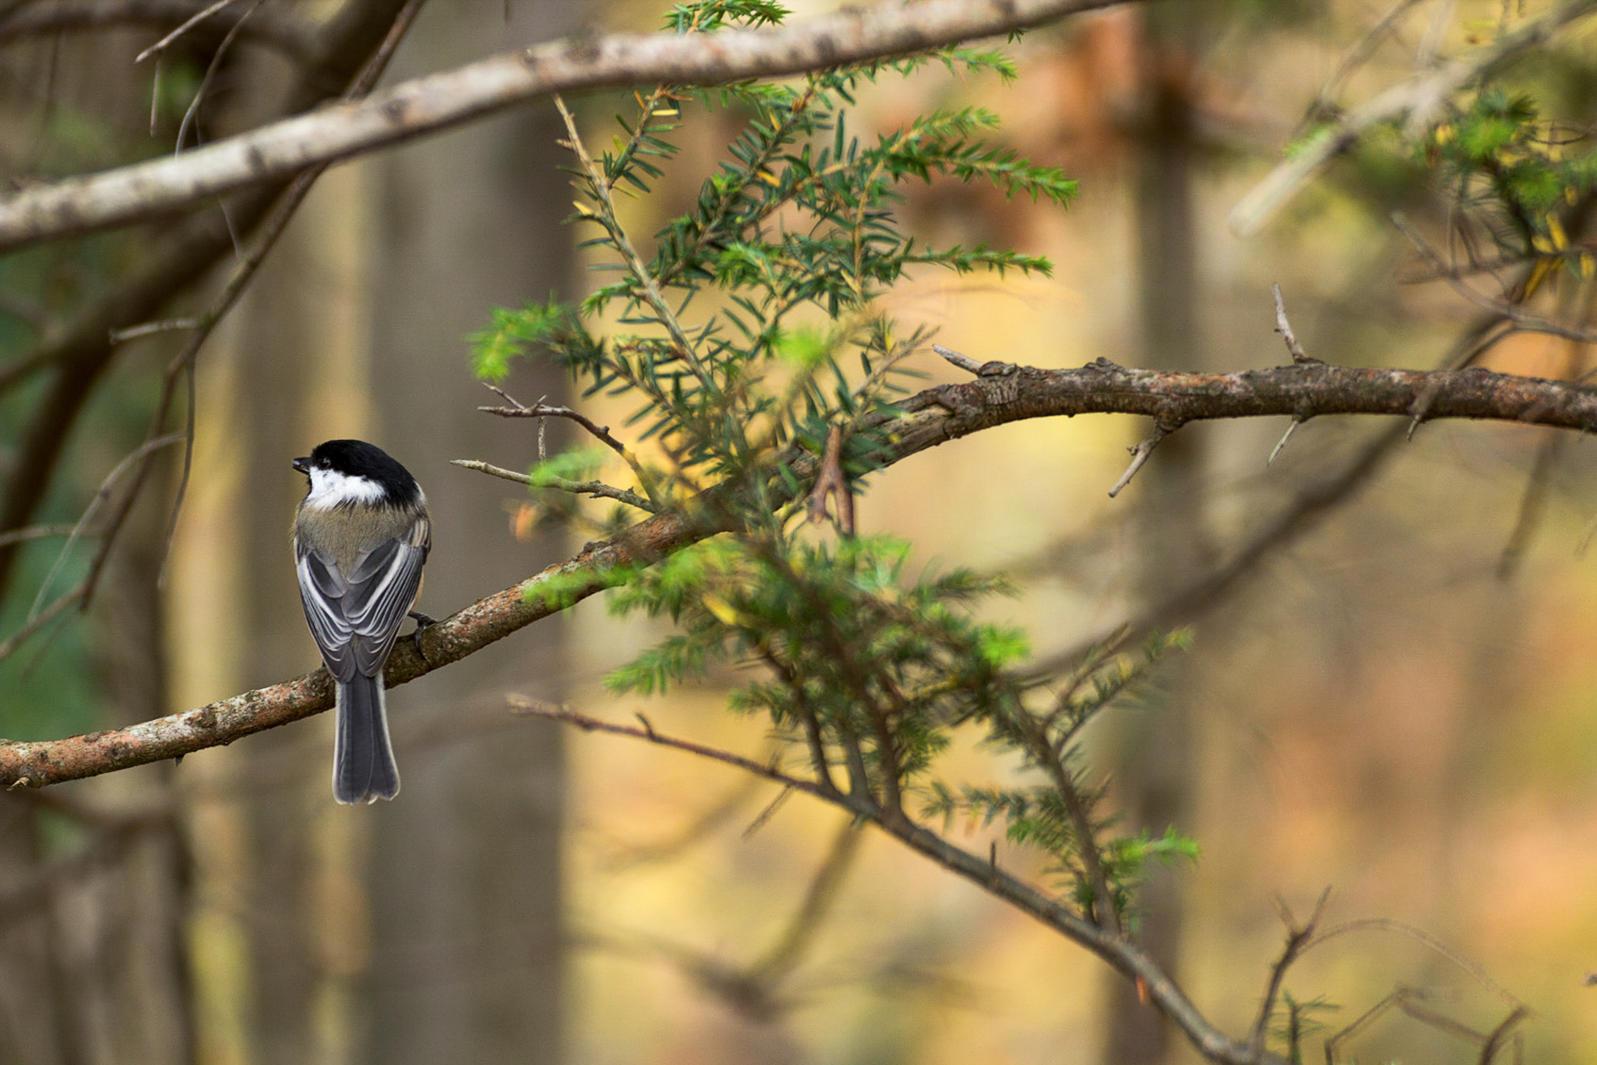 Black-capped Chickadee. Prabu Vasan/Audubon Photography Awards